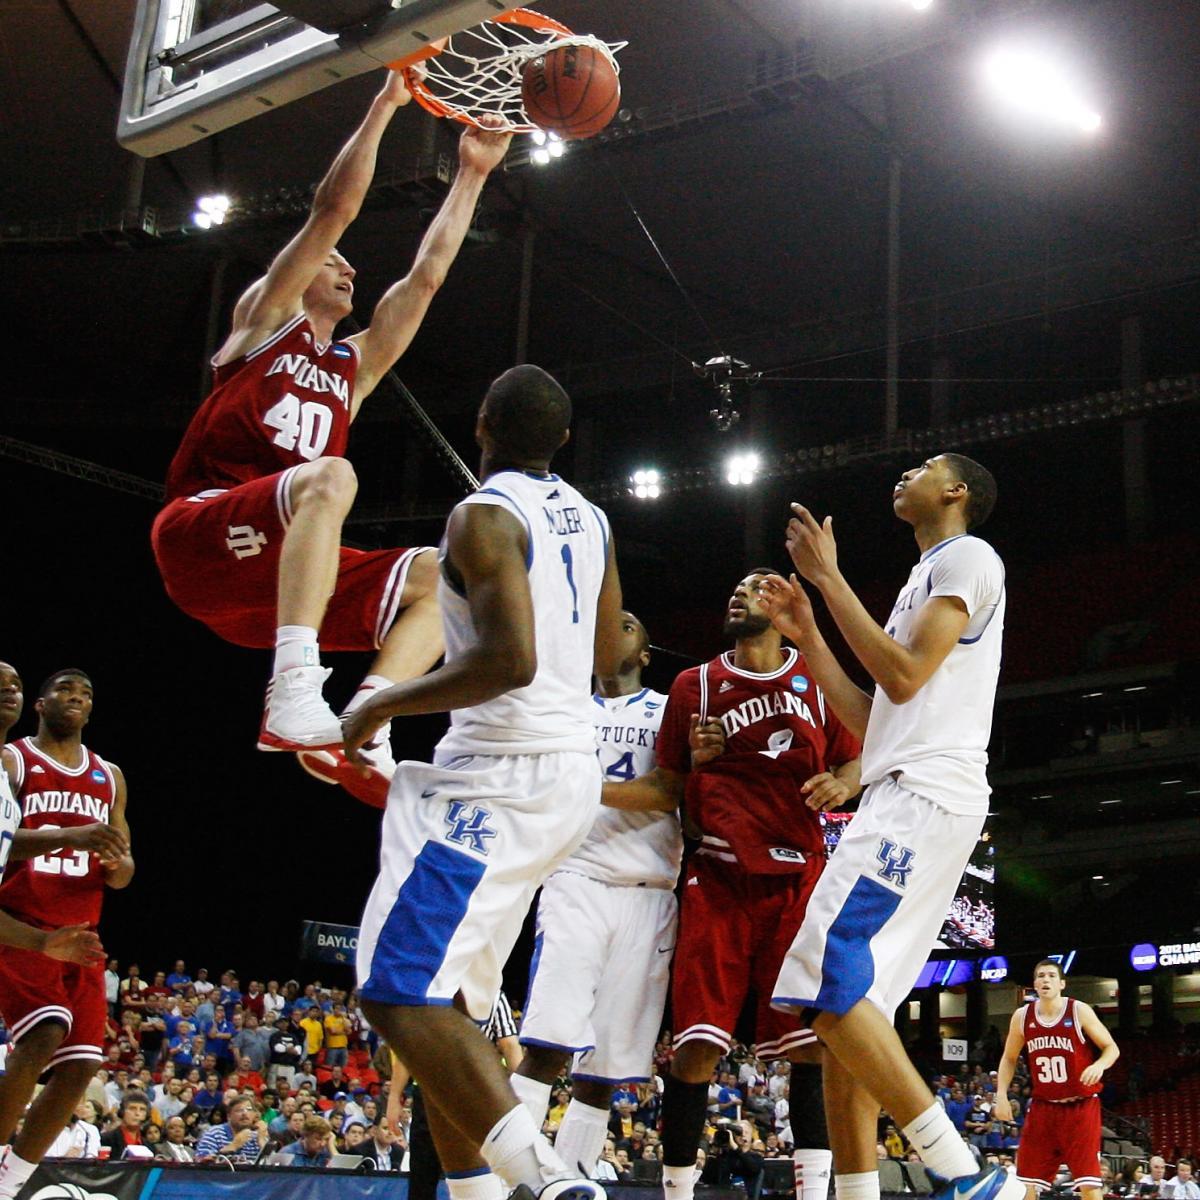 2013 NBA Mock Draft: Replacing 2012's Picks With Next Year